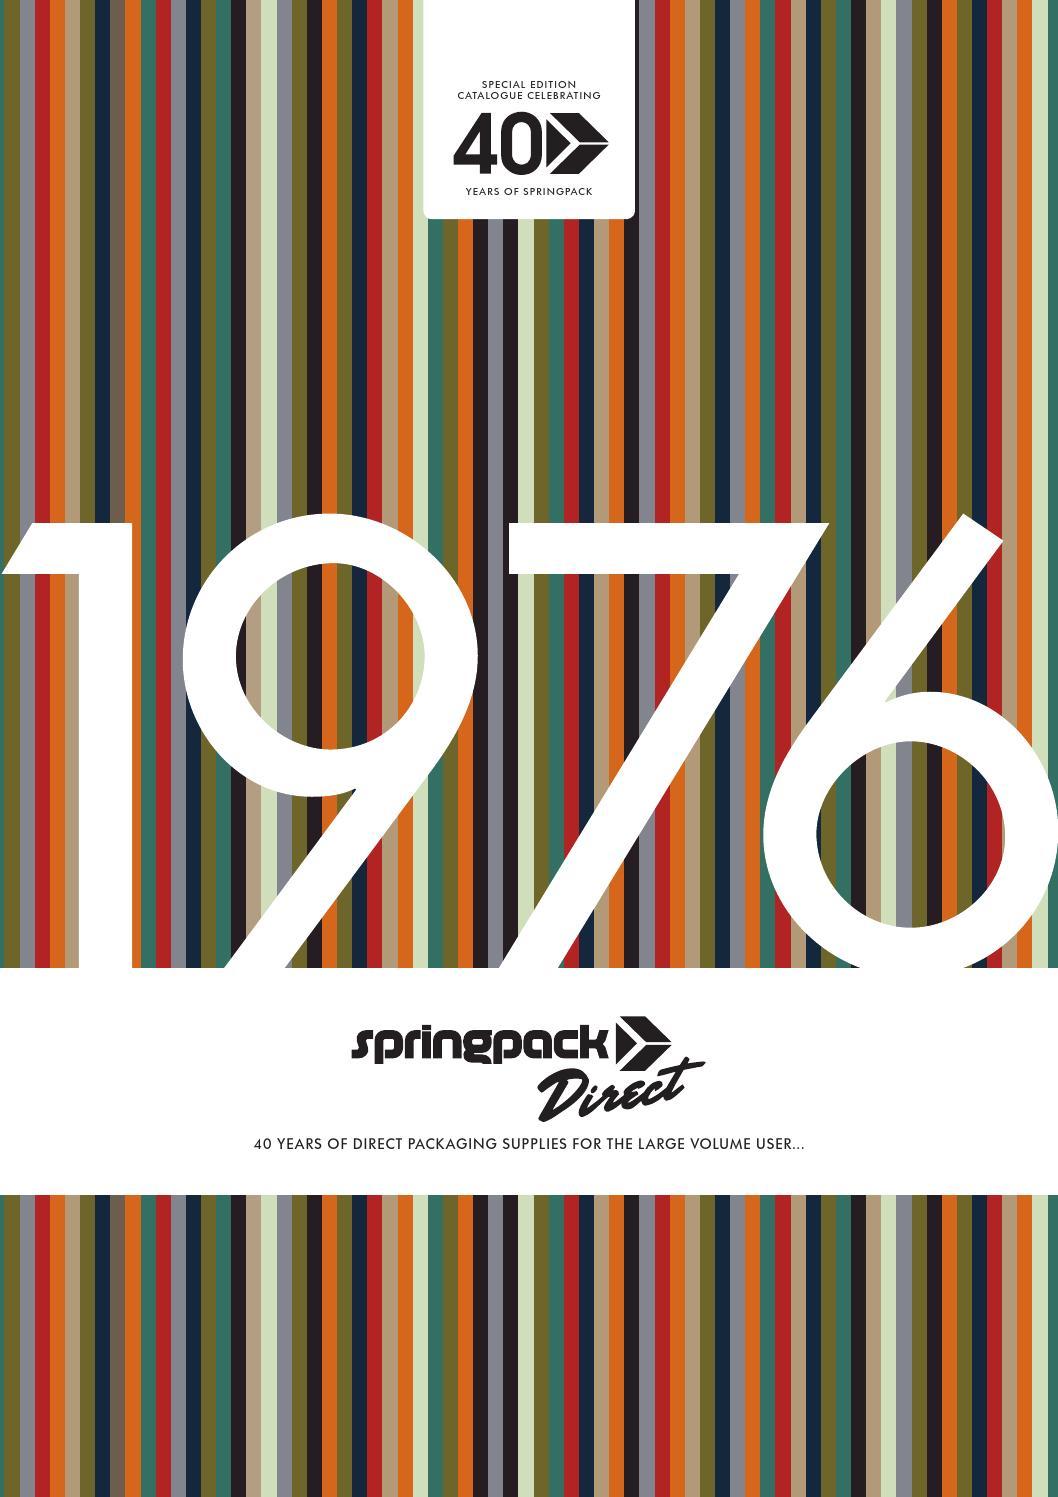 Springpack Direct Catalogue 2016 By Ltd Issuu Royal 90 Polos Envelope 80 Gsm White 100 Envelopes Box 1